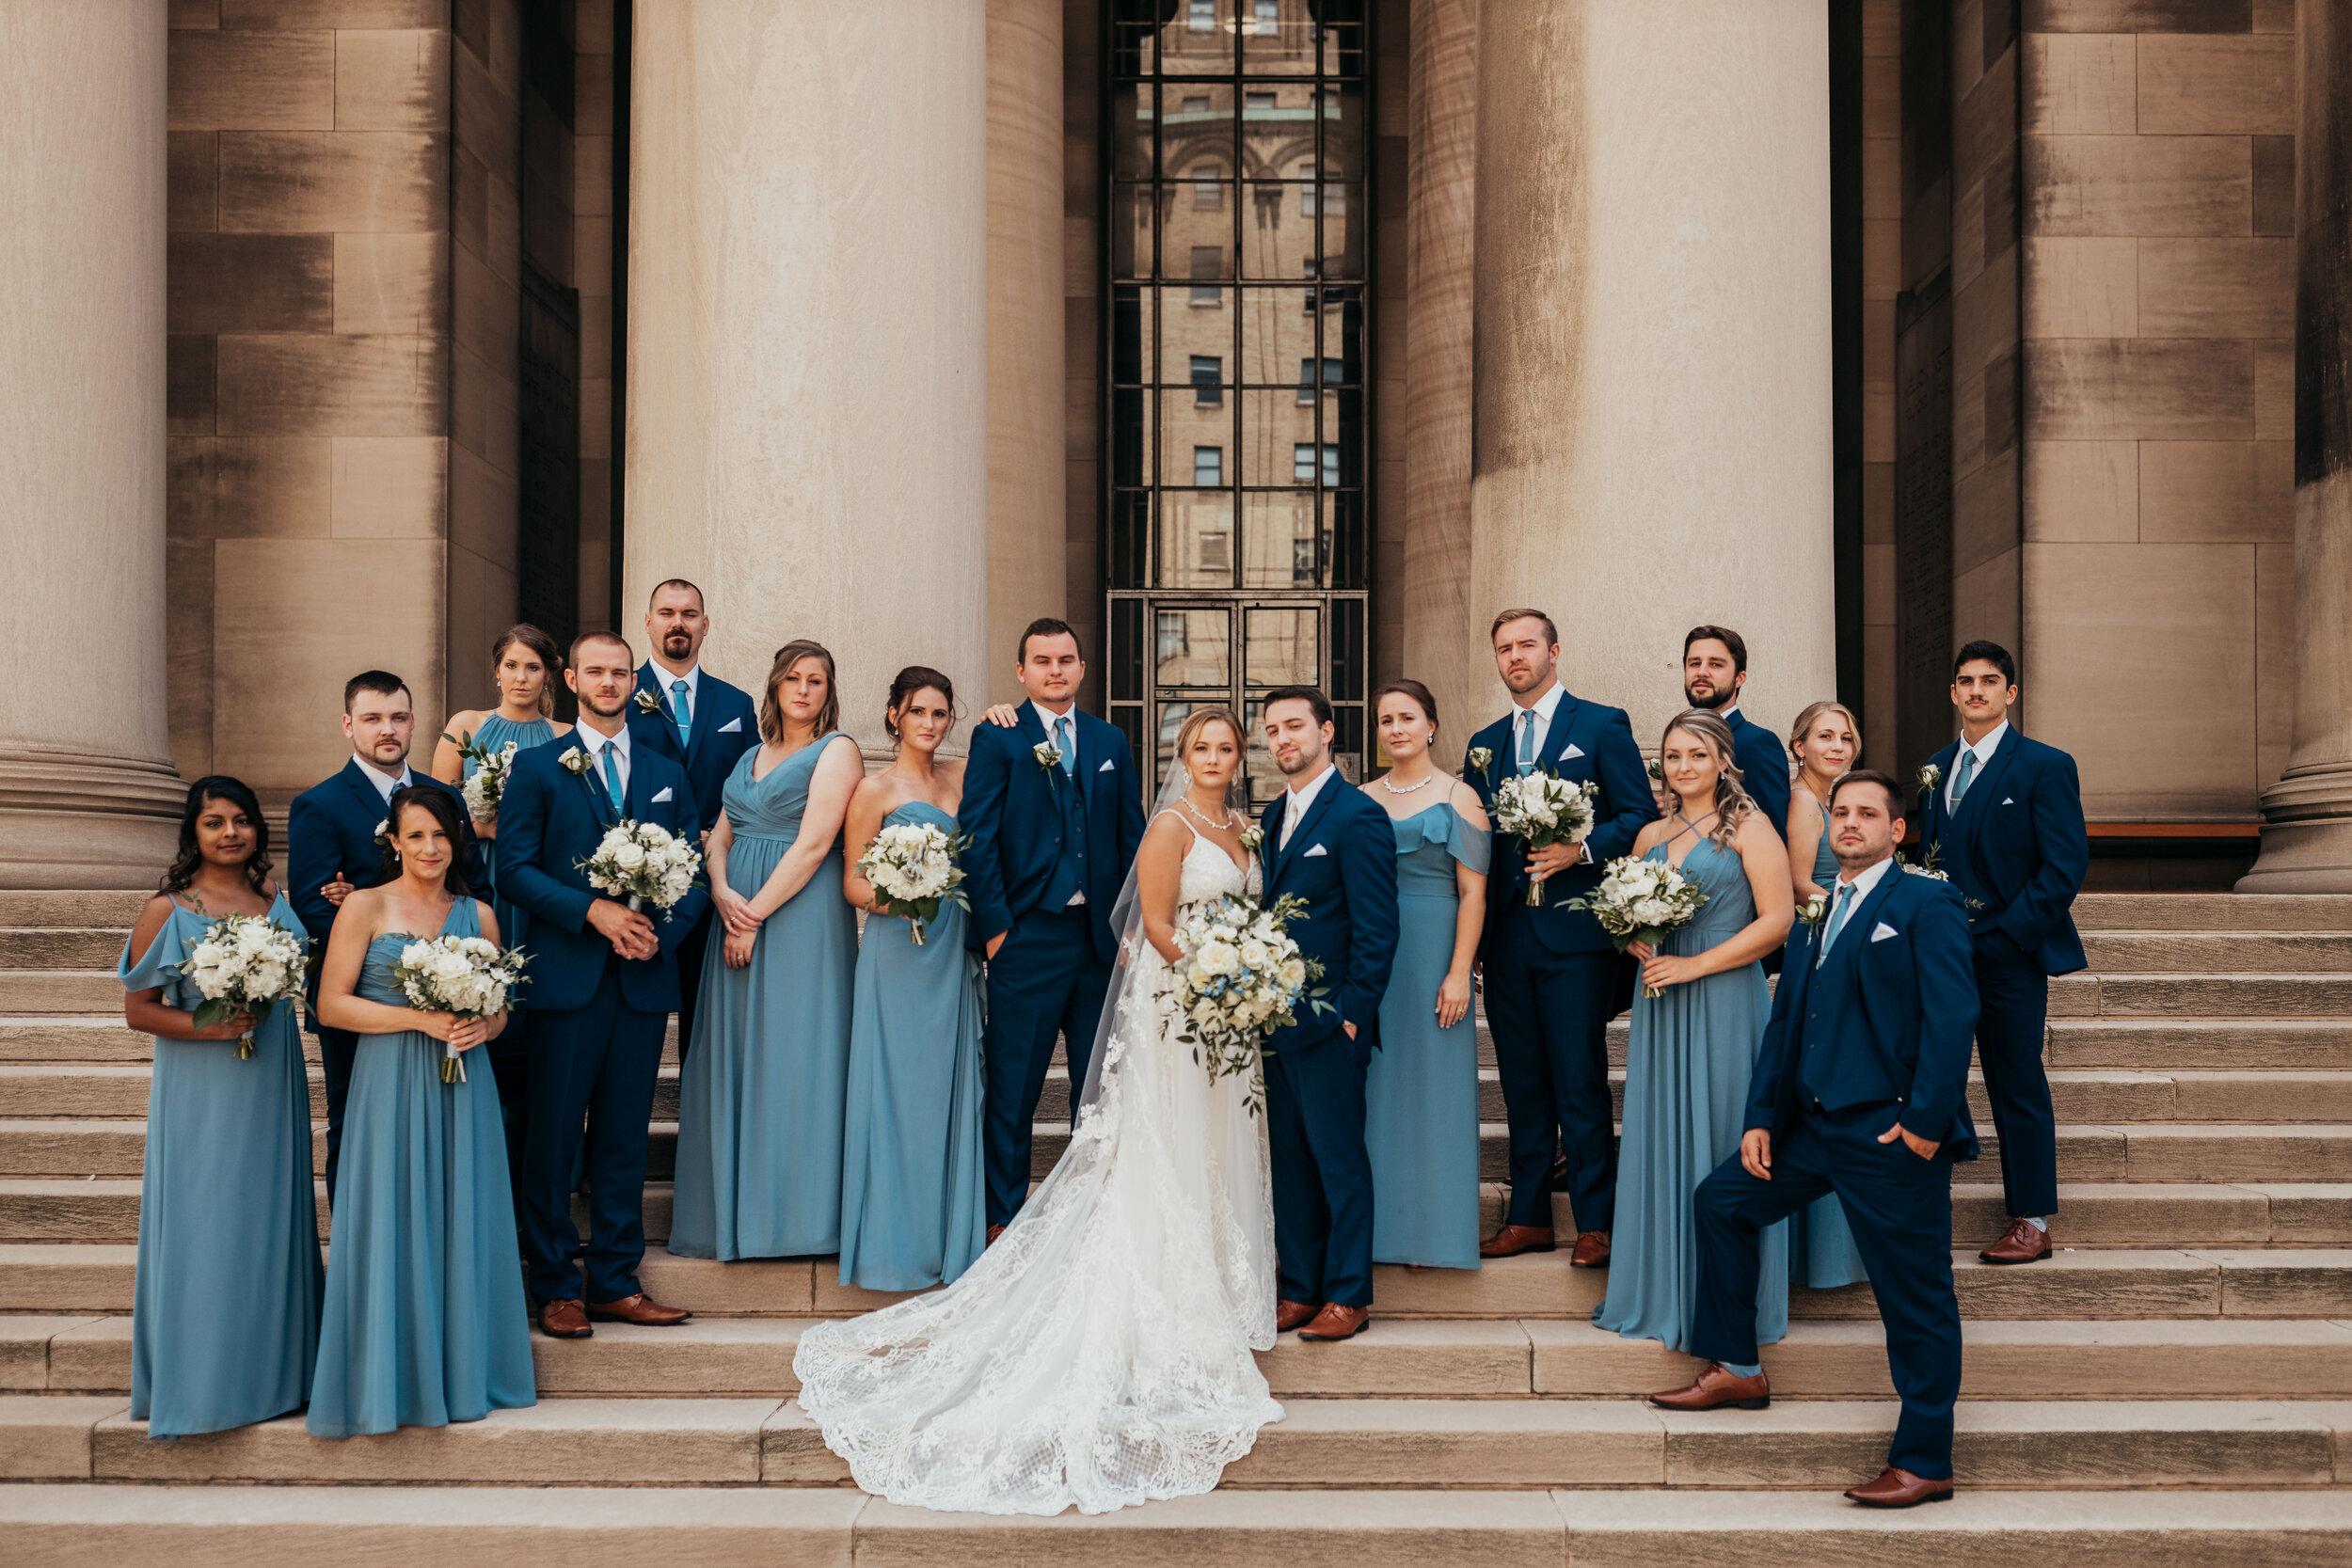 Pittsburgh wedding photography - Hartwood Acres Mansion wedding-336.jpg